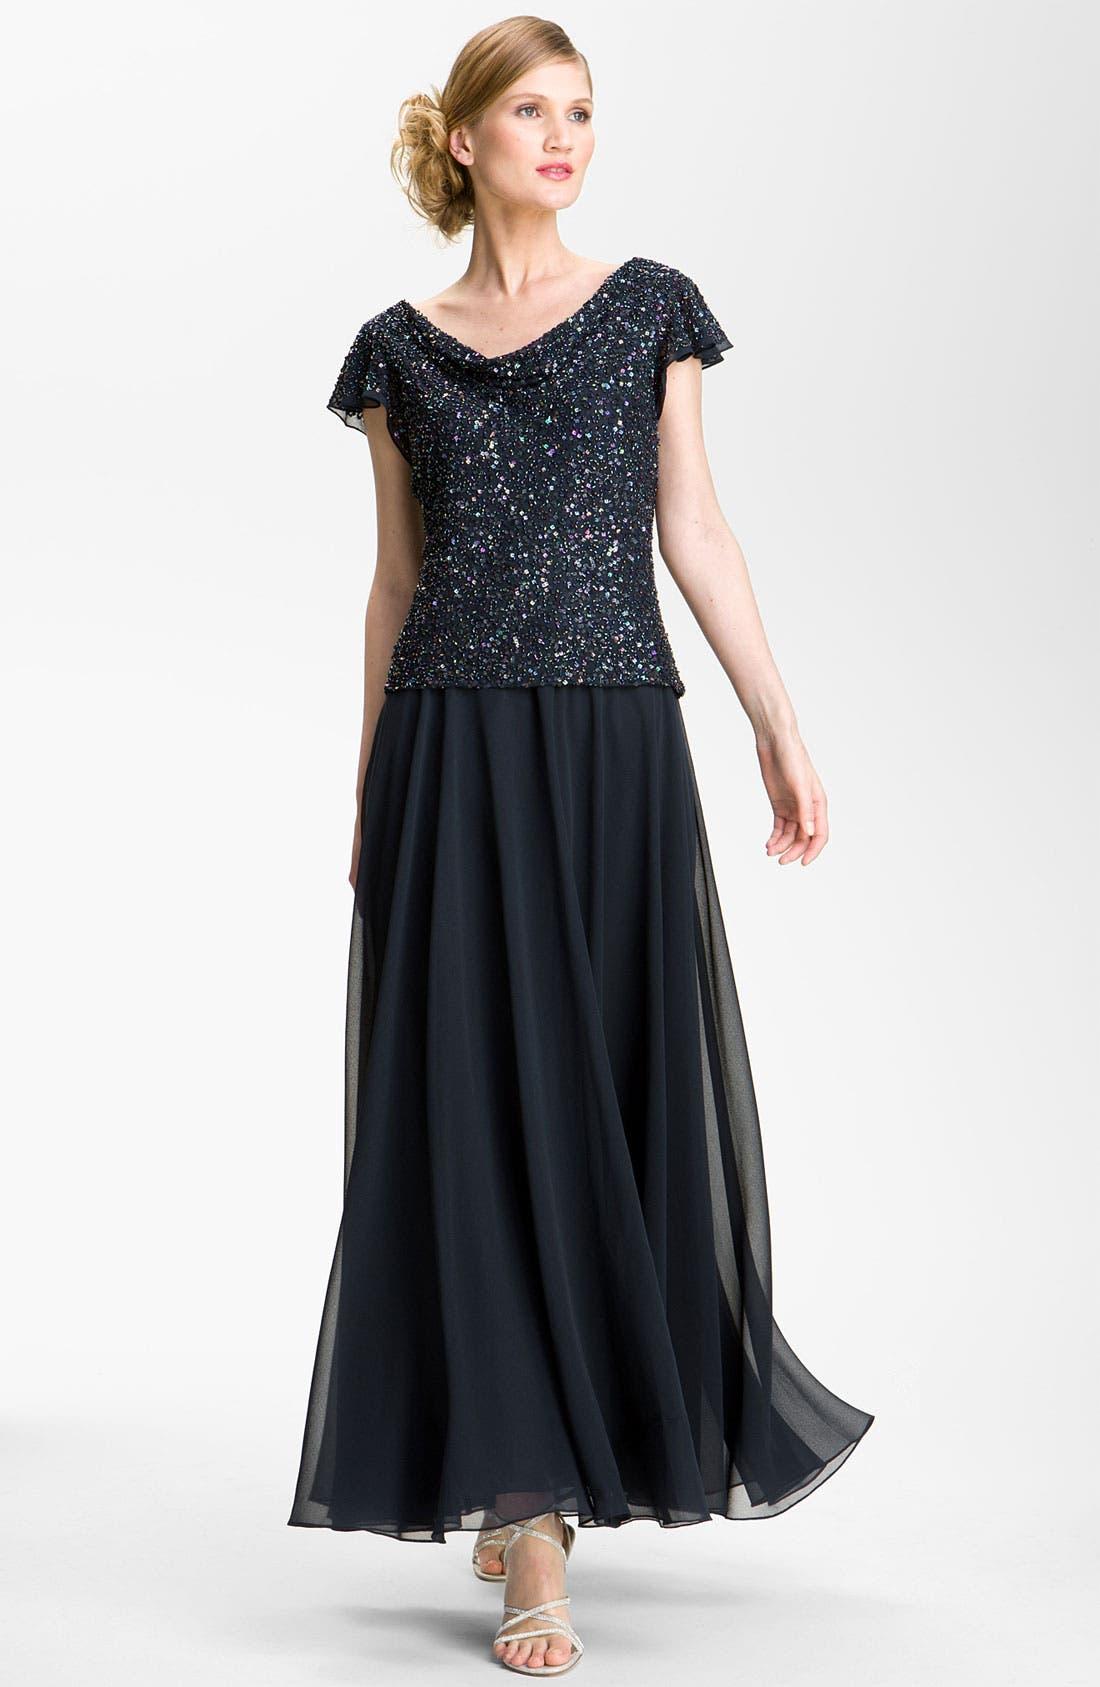 Alternate Image 1 Selected - J Kara Sequin Flutter Sleeve Chiffon Gown